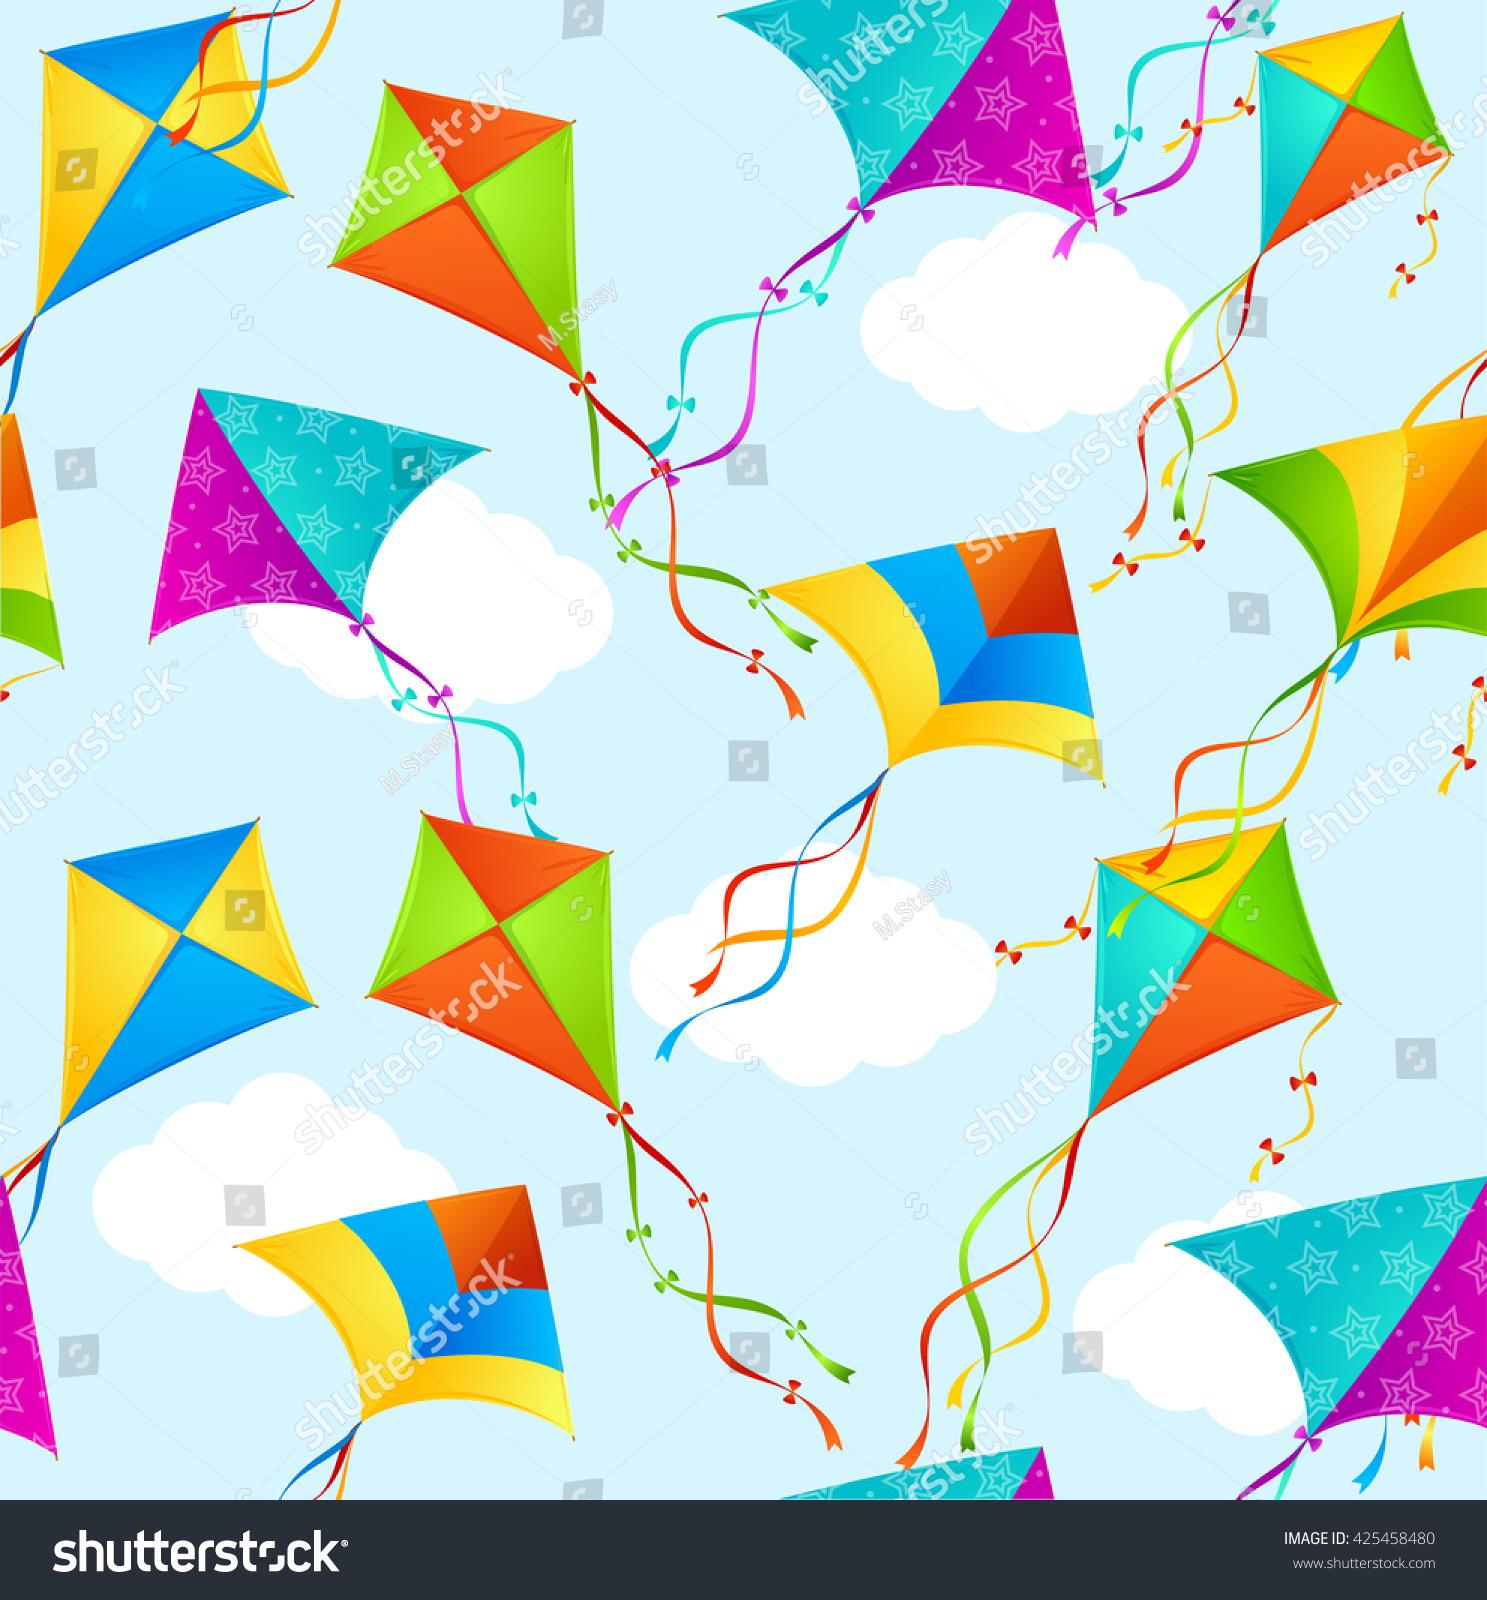 Kite background pattern seamless on sky stock illustration kite background pattern seamless on sky illustration biocorpaavc